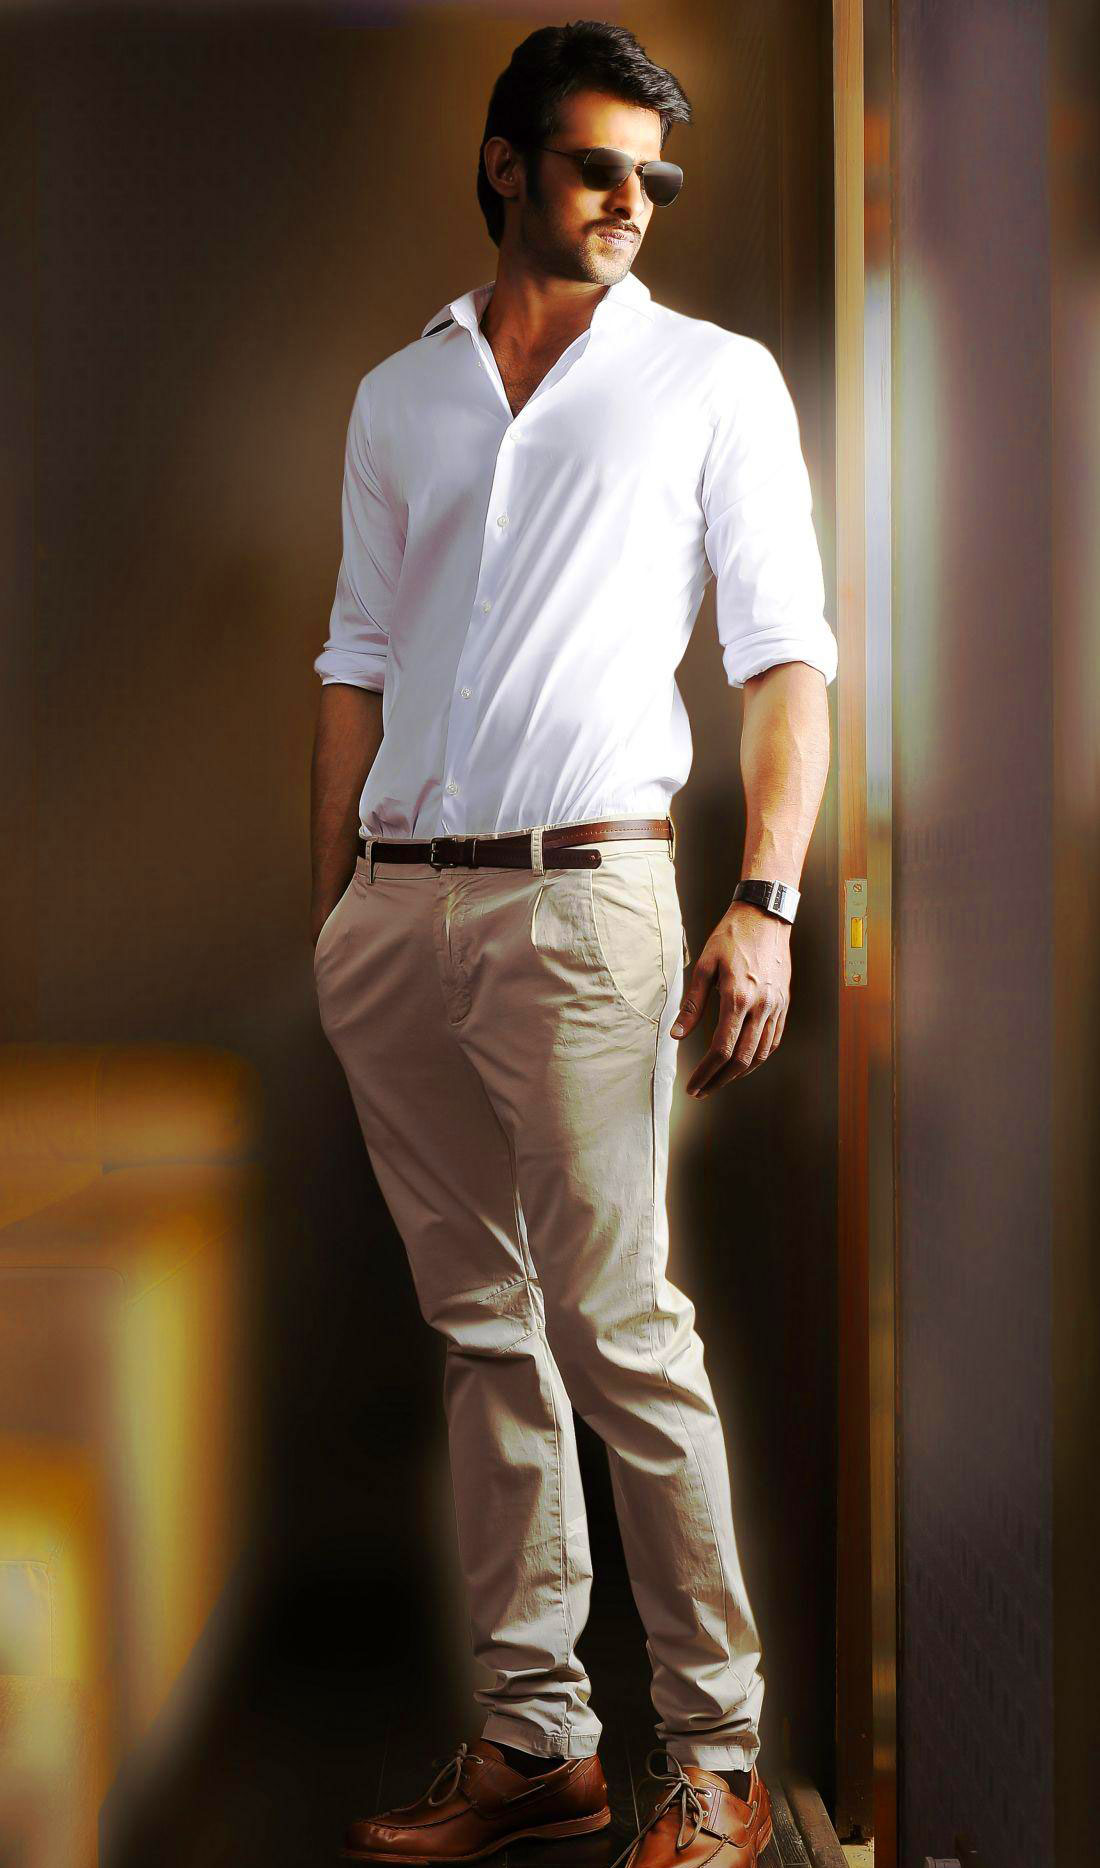 Latest Superstar Prabhas Images wallpaper photo download